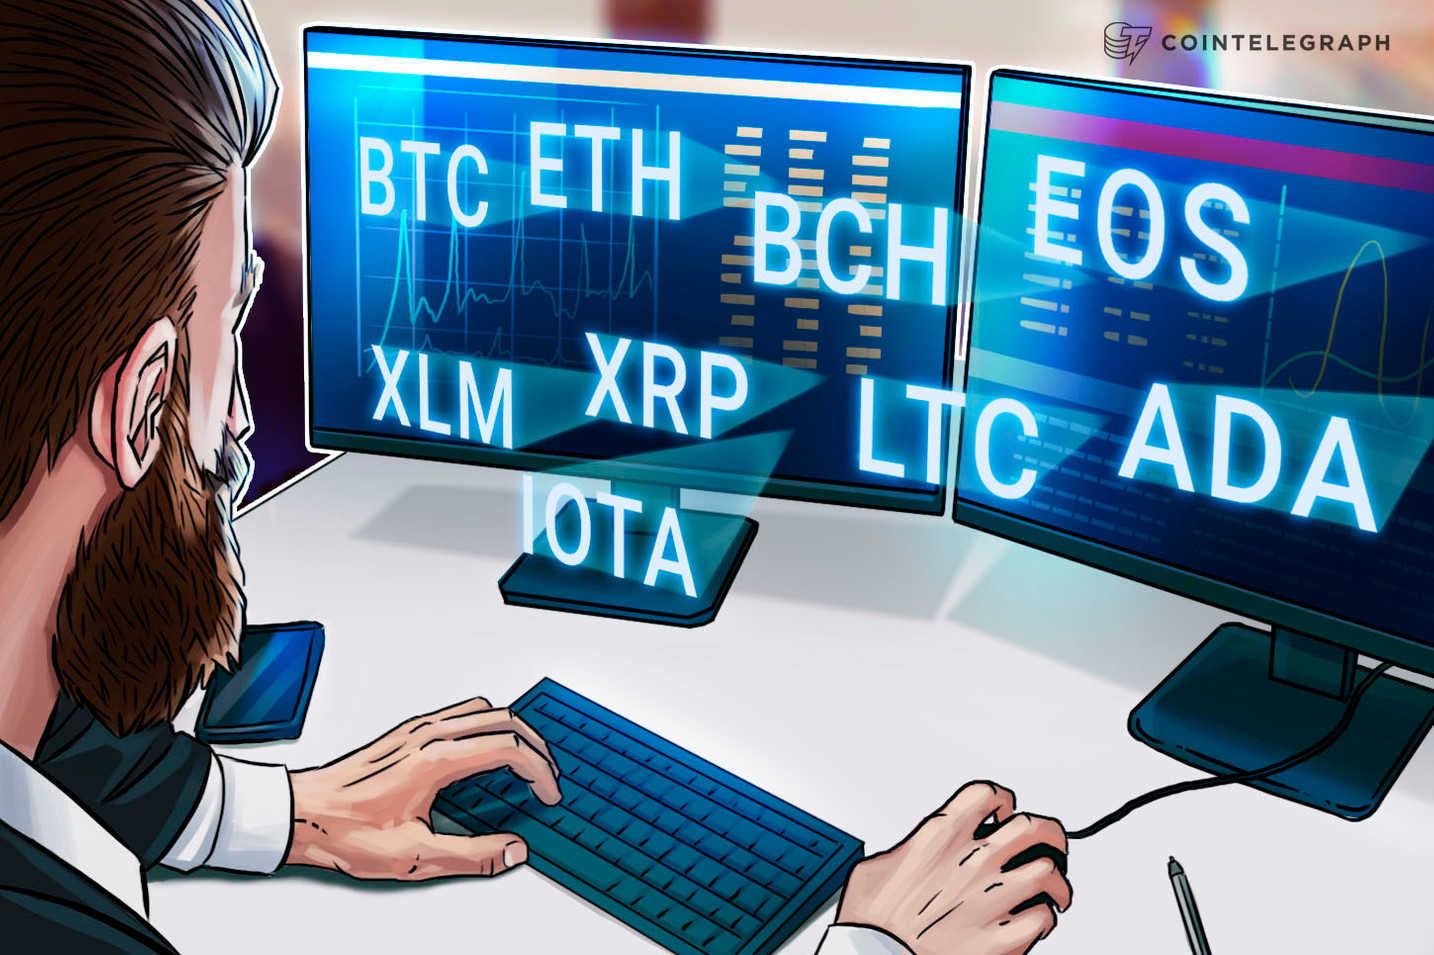 Bitcoin, Ethereum, Ripple, Bitcoin Cash, EOS, Litecoin, Cardano, Stellar, IOTA: Analisi dei prezzi, 8 giugno